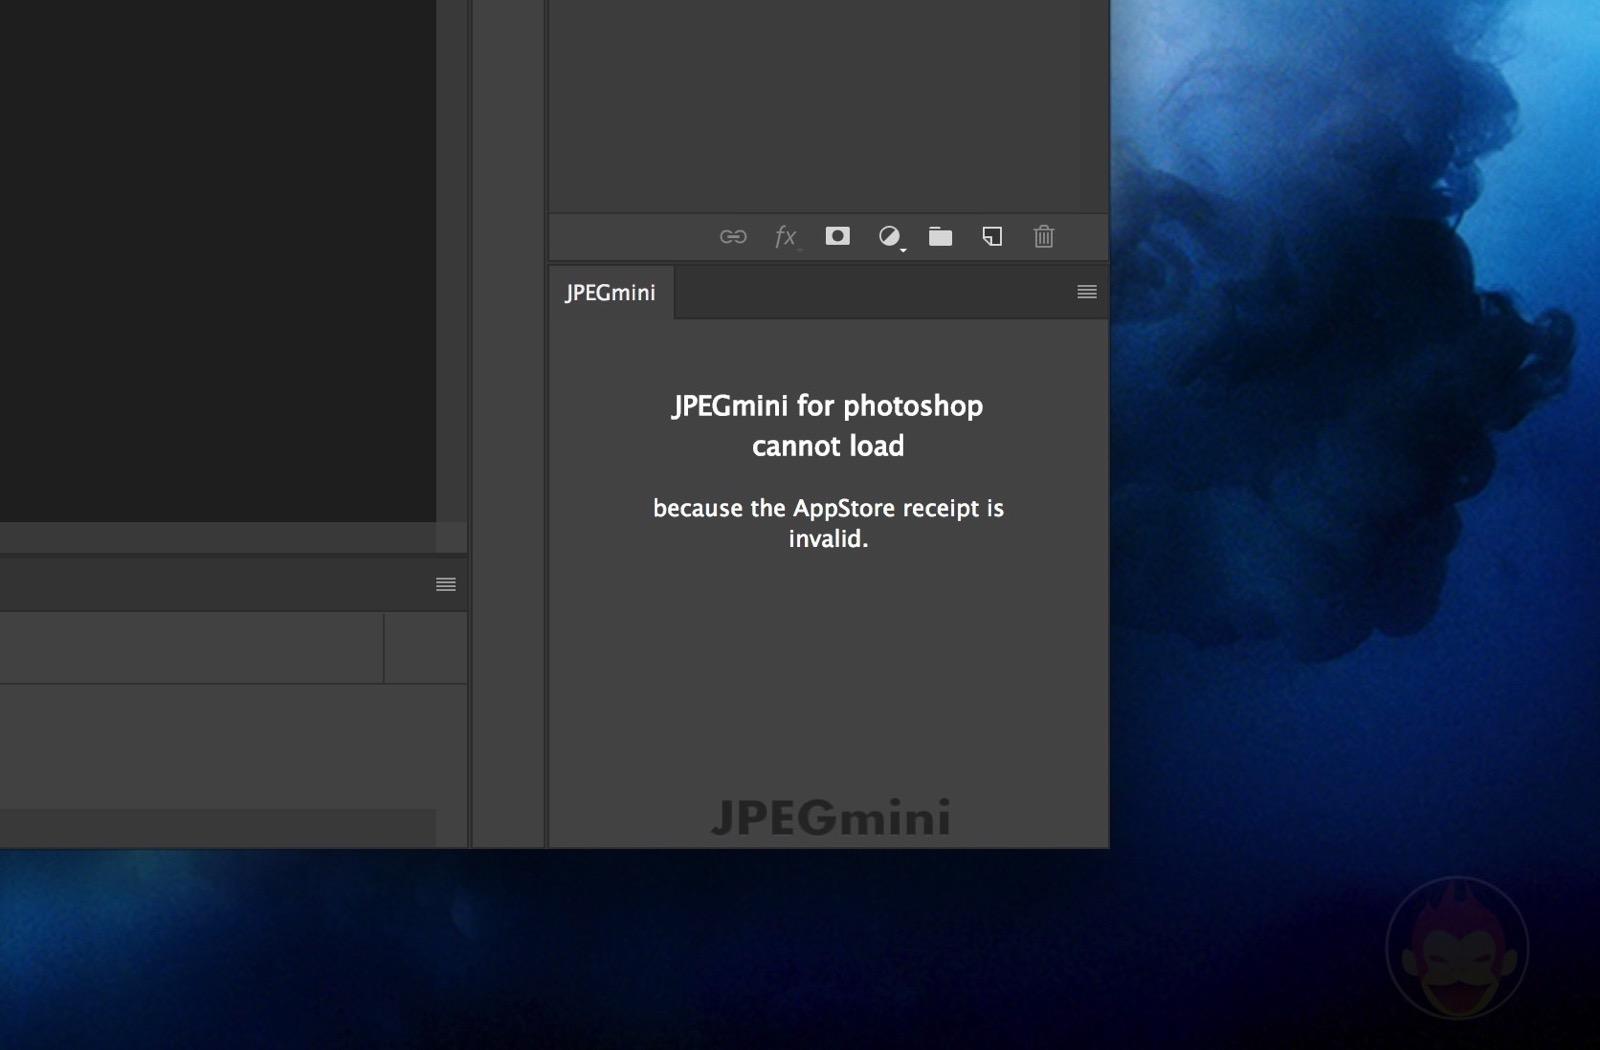 JPEGmini Plugin for photoshop error 05